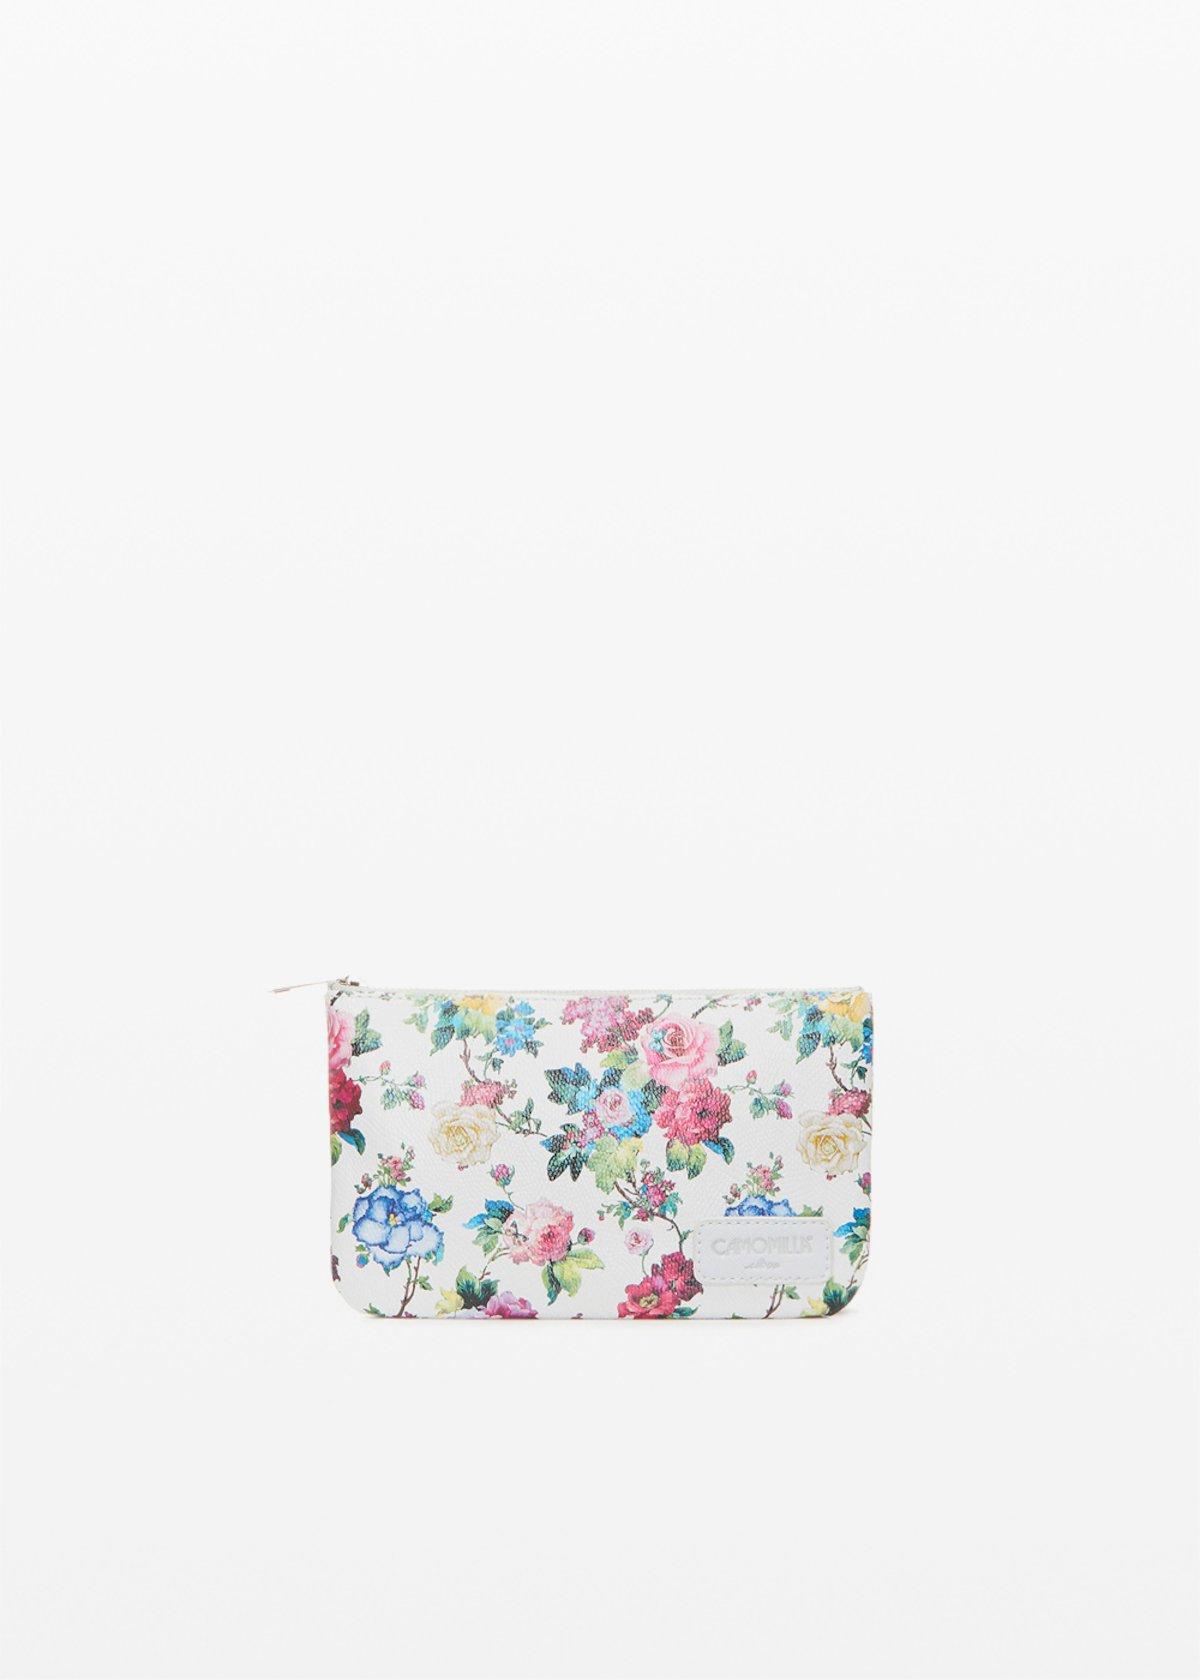 Small bag Tongaflo1 in ecopelle flowers print - Light Grey Fantasia - Donna - Immagine categoria